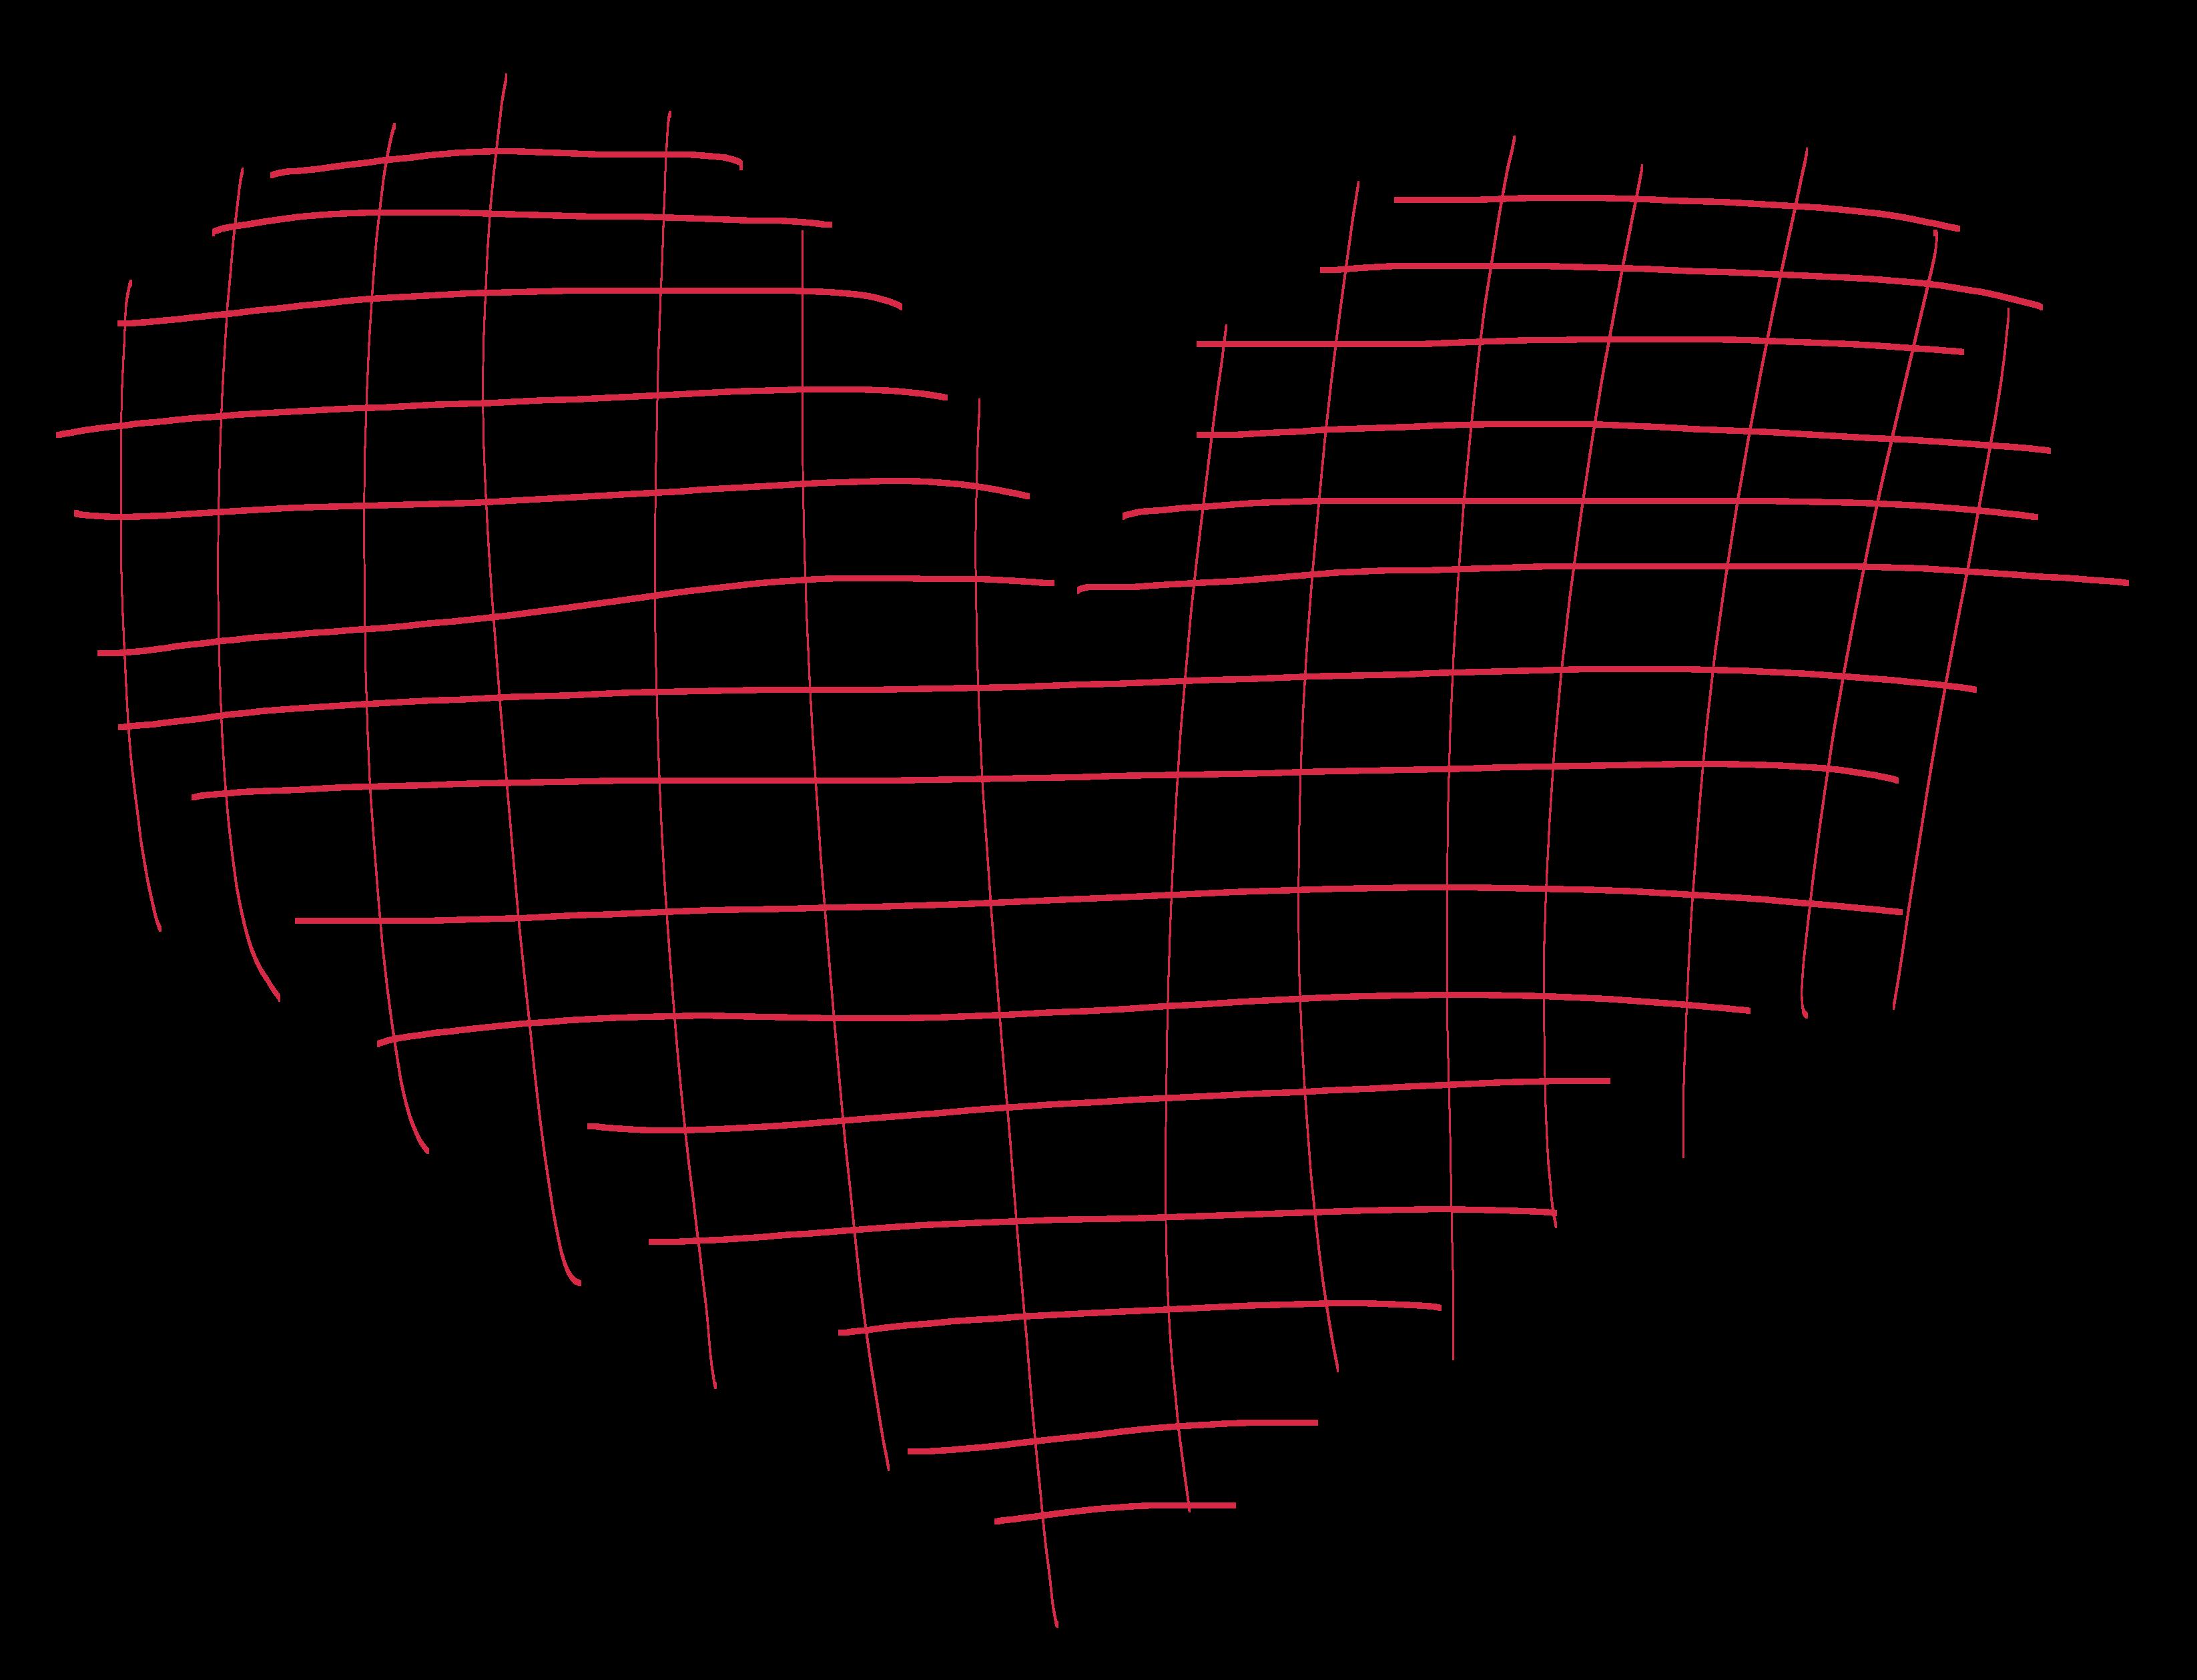 doodle-heart-5